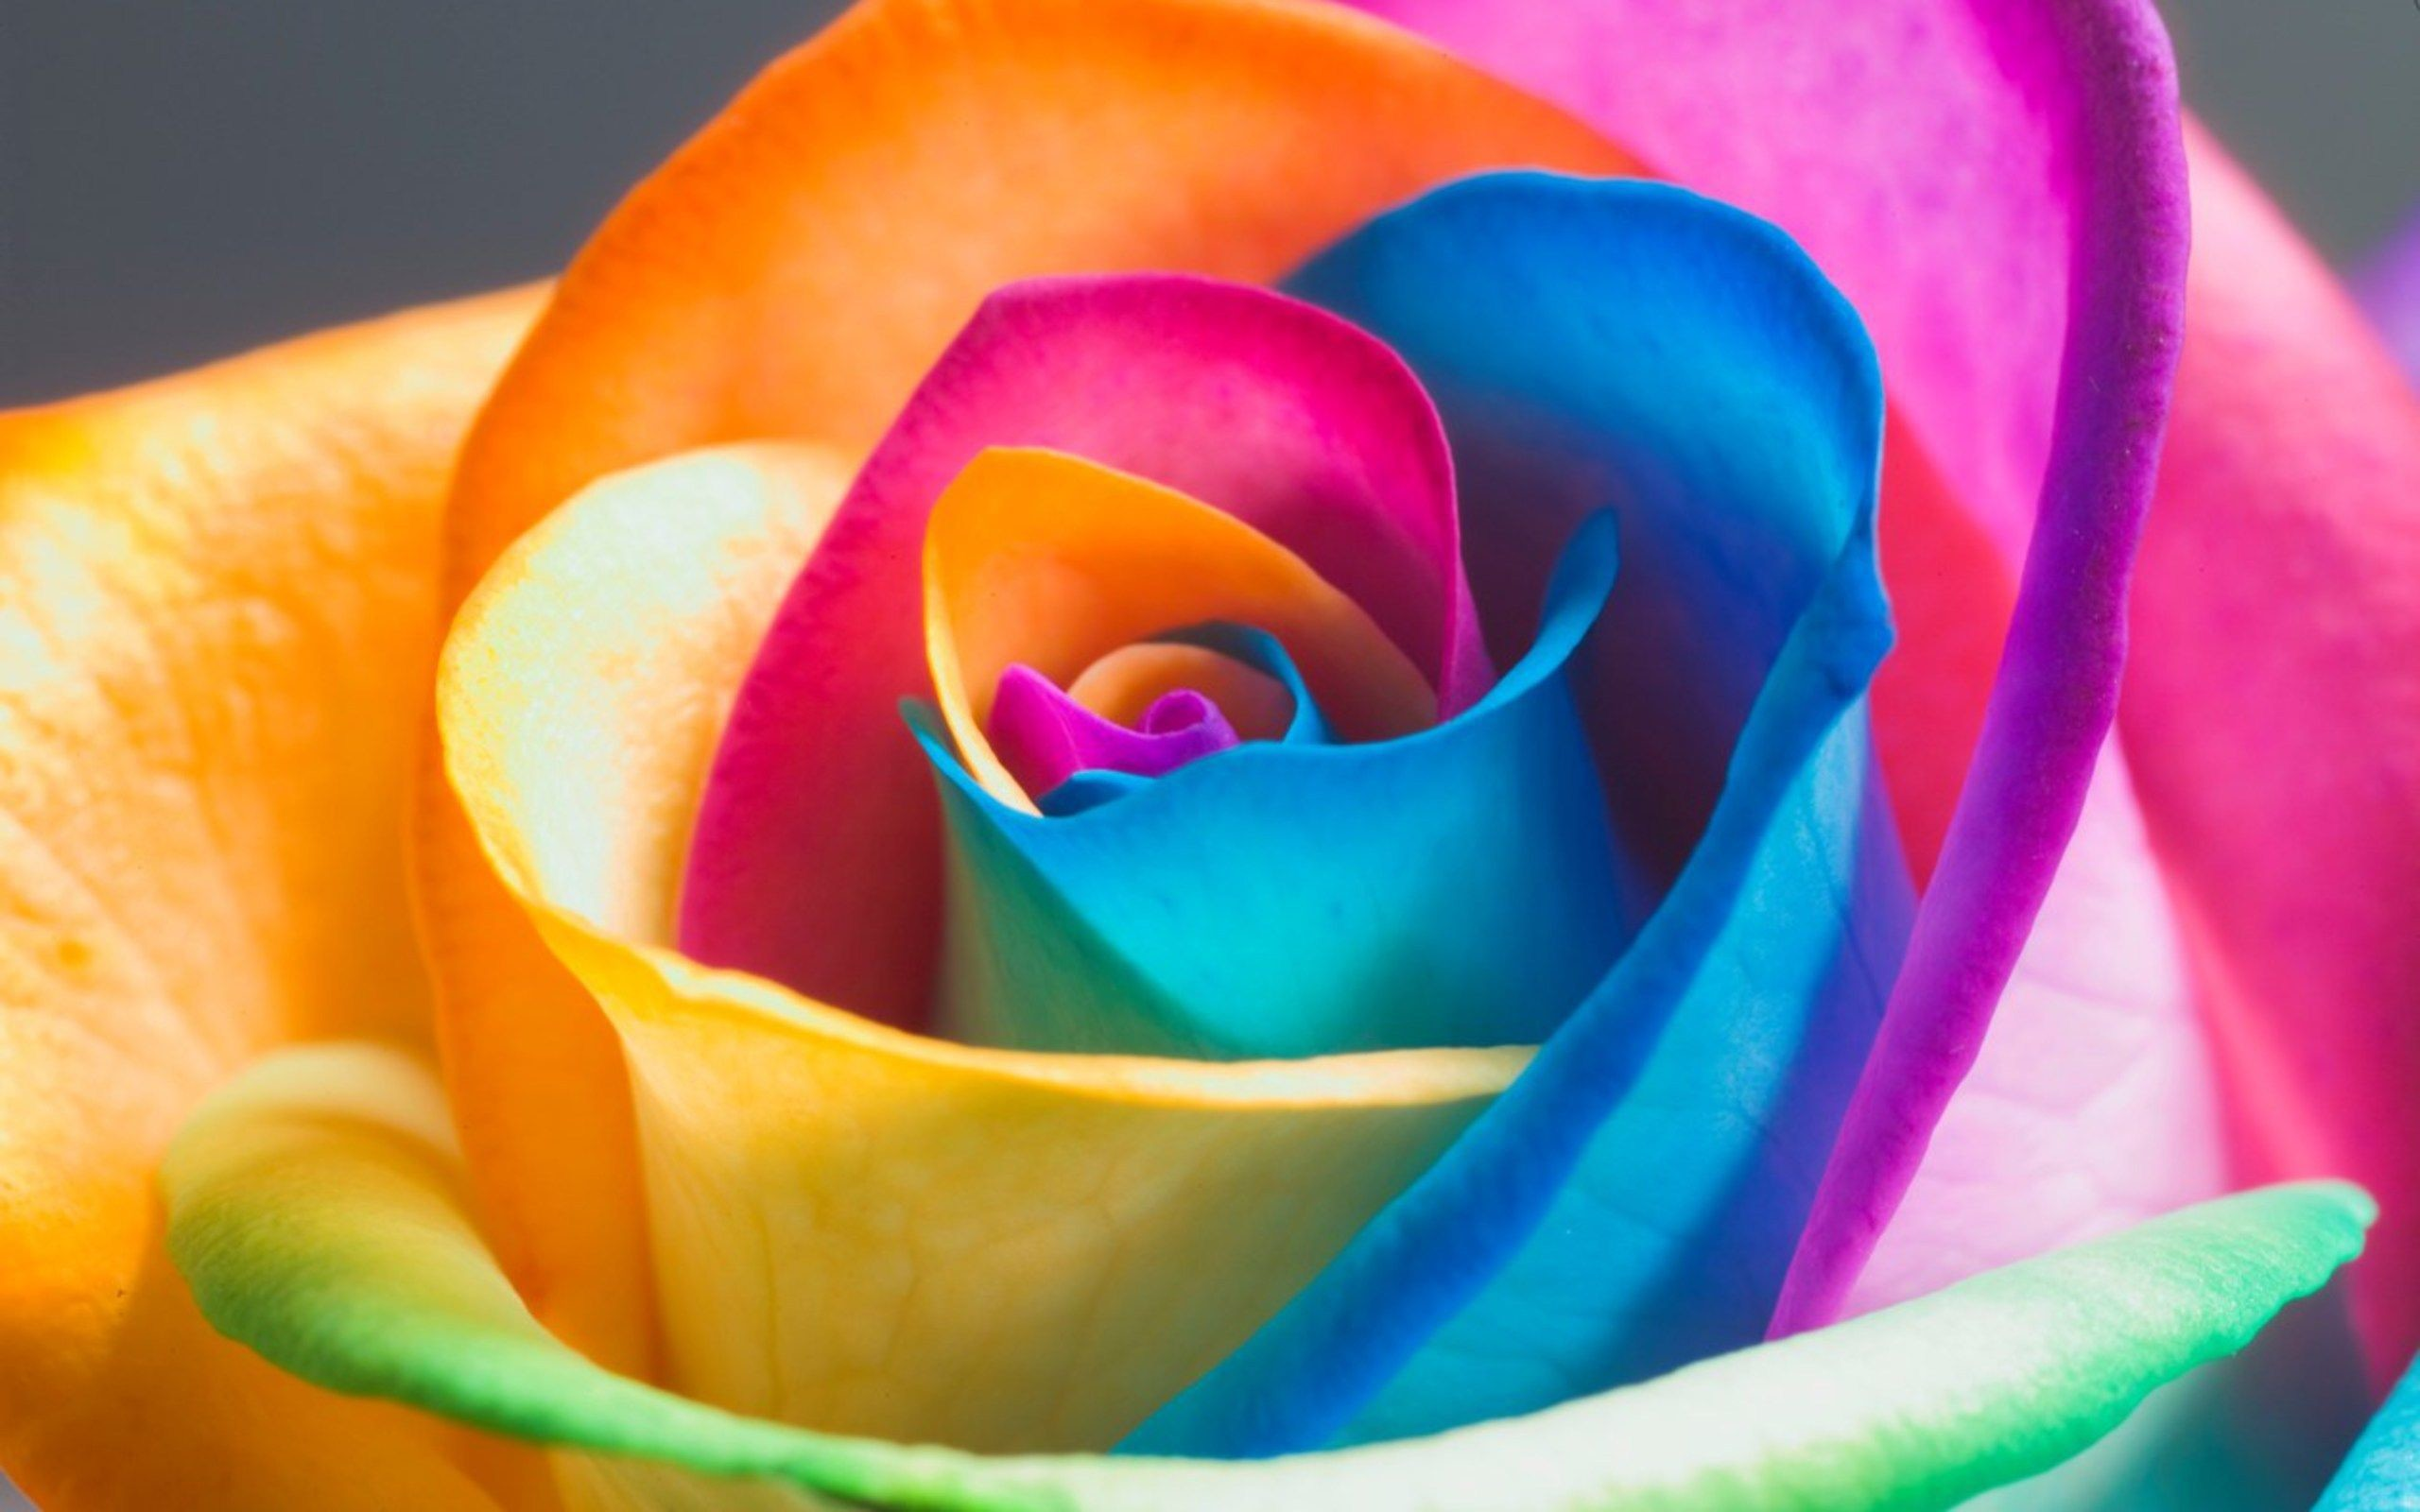 Garden plants Beautiful Rainbow Rose Seeds Multi-colored Rose seed – Decor  Home Ideas